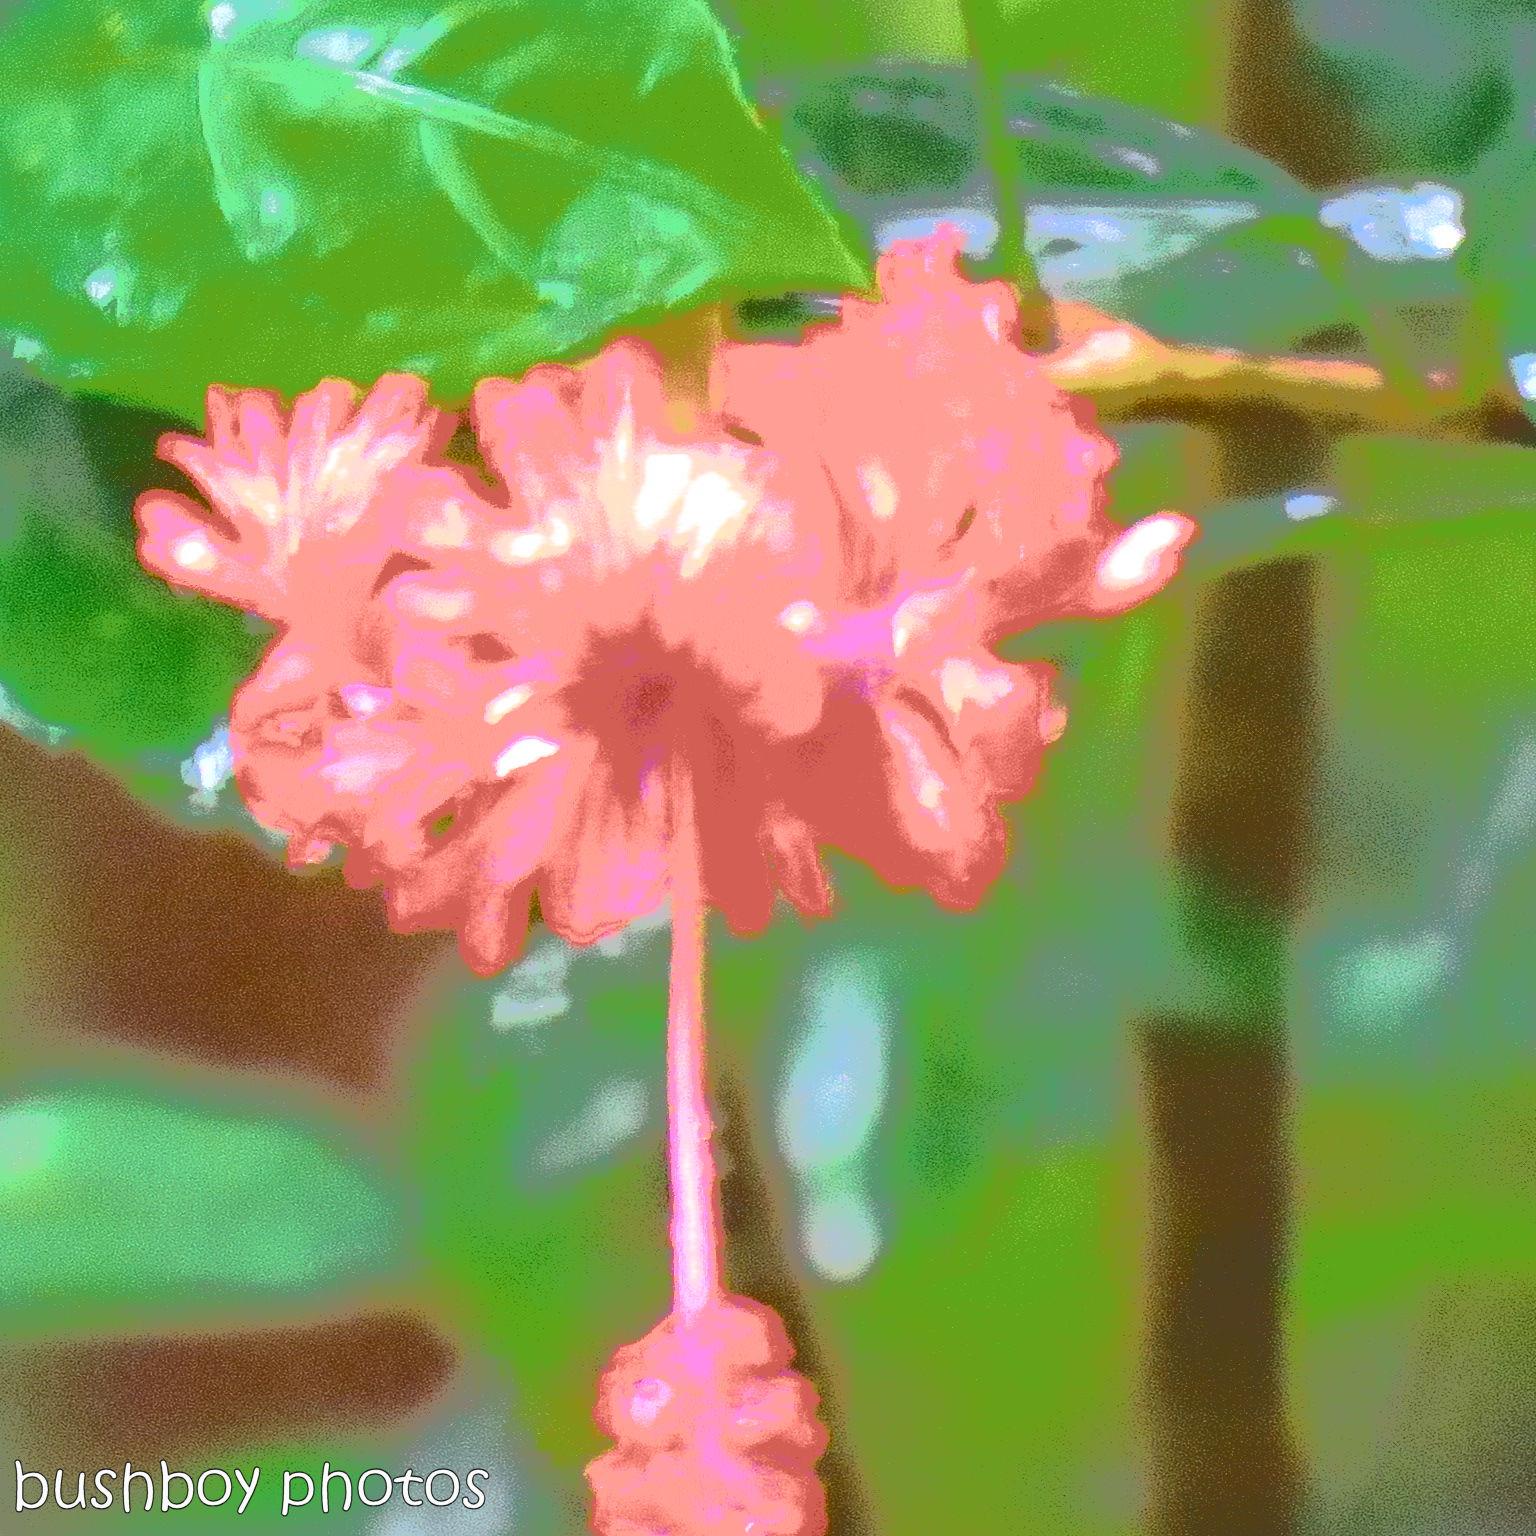 hibiscus flower_changed_named_binna burra_june 2017